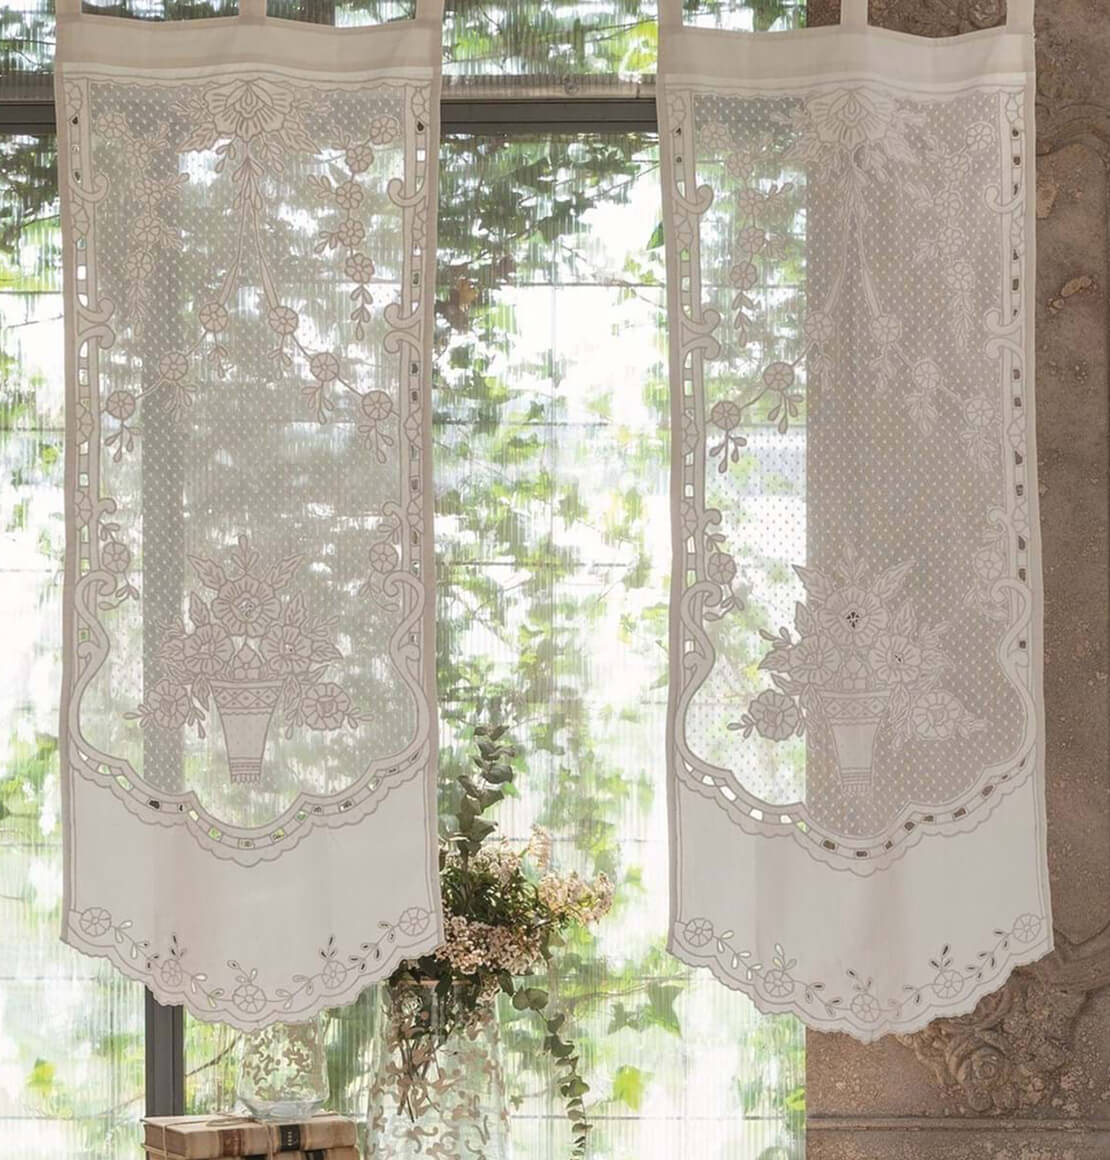 tendine in cotone blanc mariclò